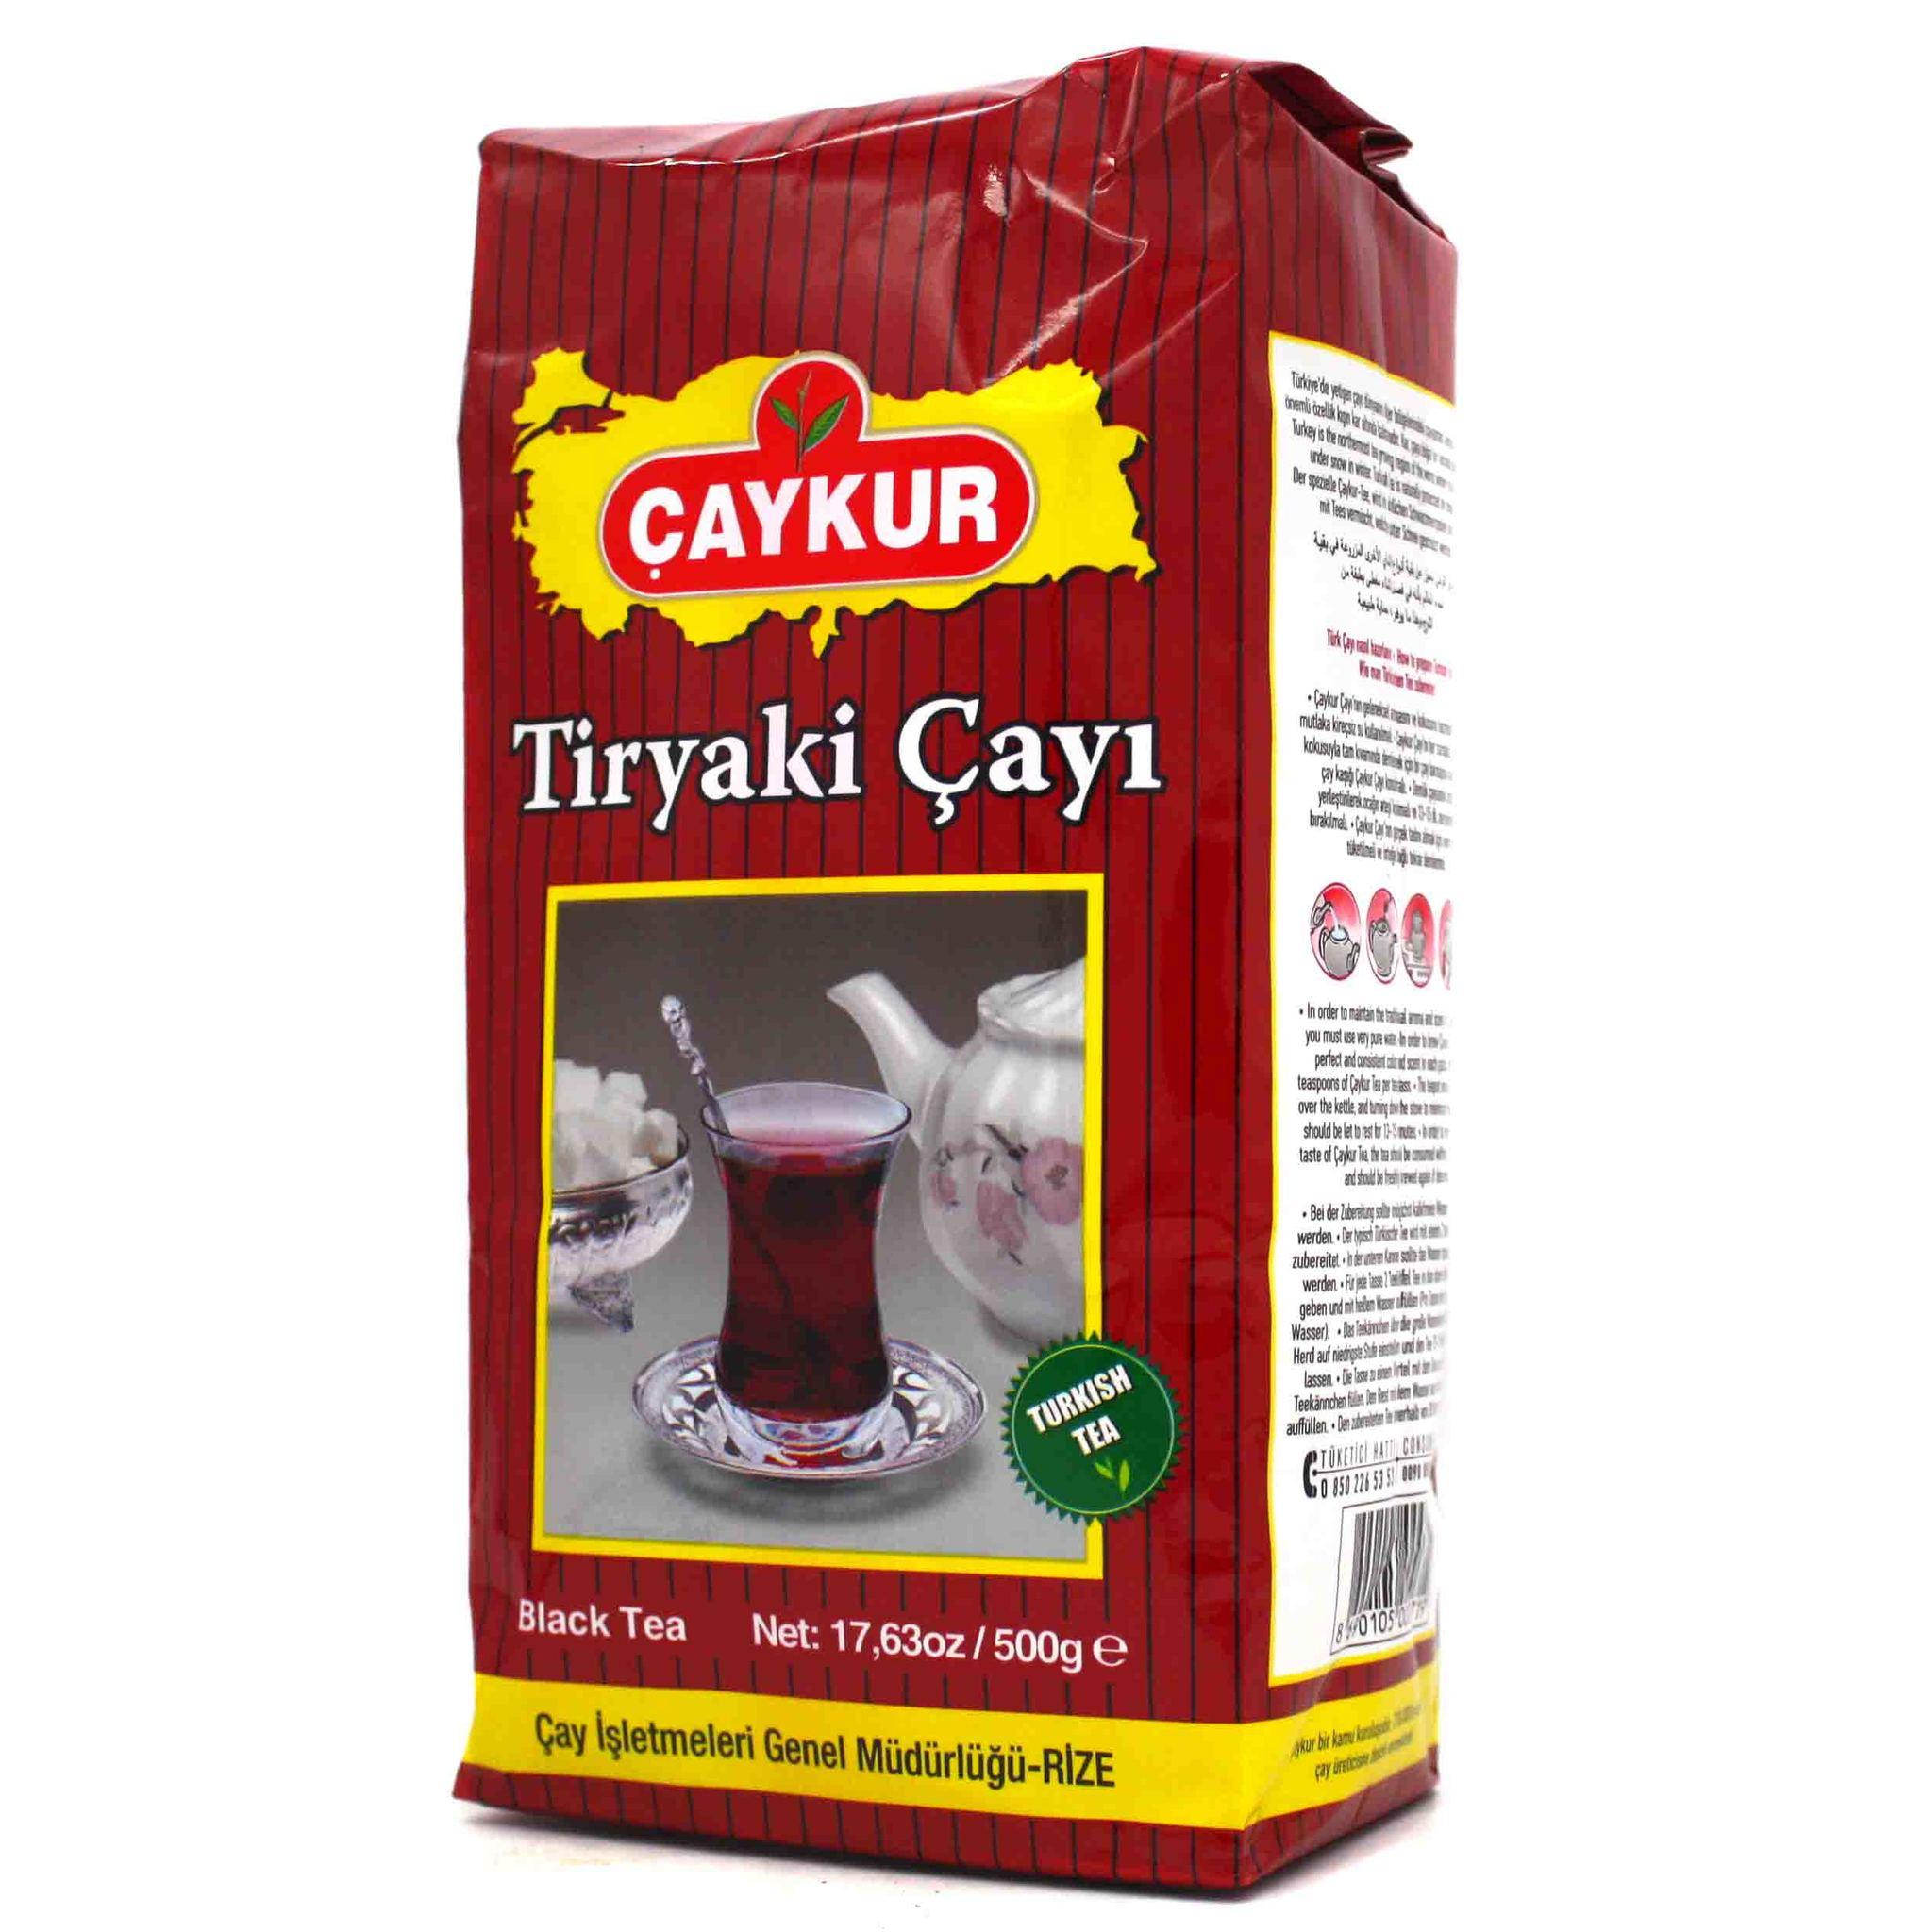 Çaykur Турецкий черный чай Tiryaki, Çaykur, 500 г import_files_97_9722ec296c5511eaa9c7484d7ecee297_ca1bb5af7afc11eaa9c8484d7ecee297.jpg